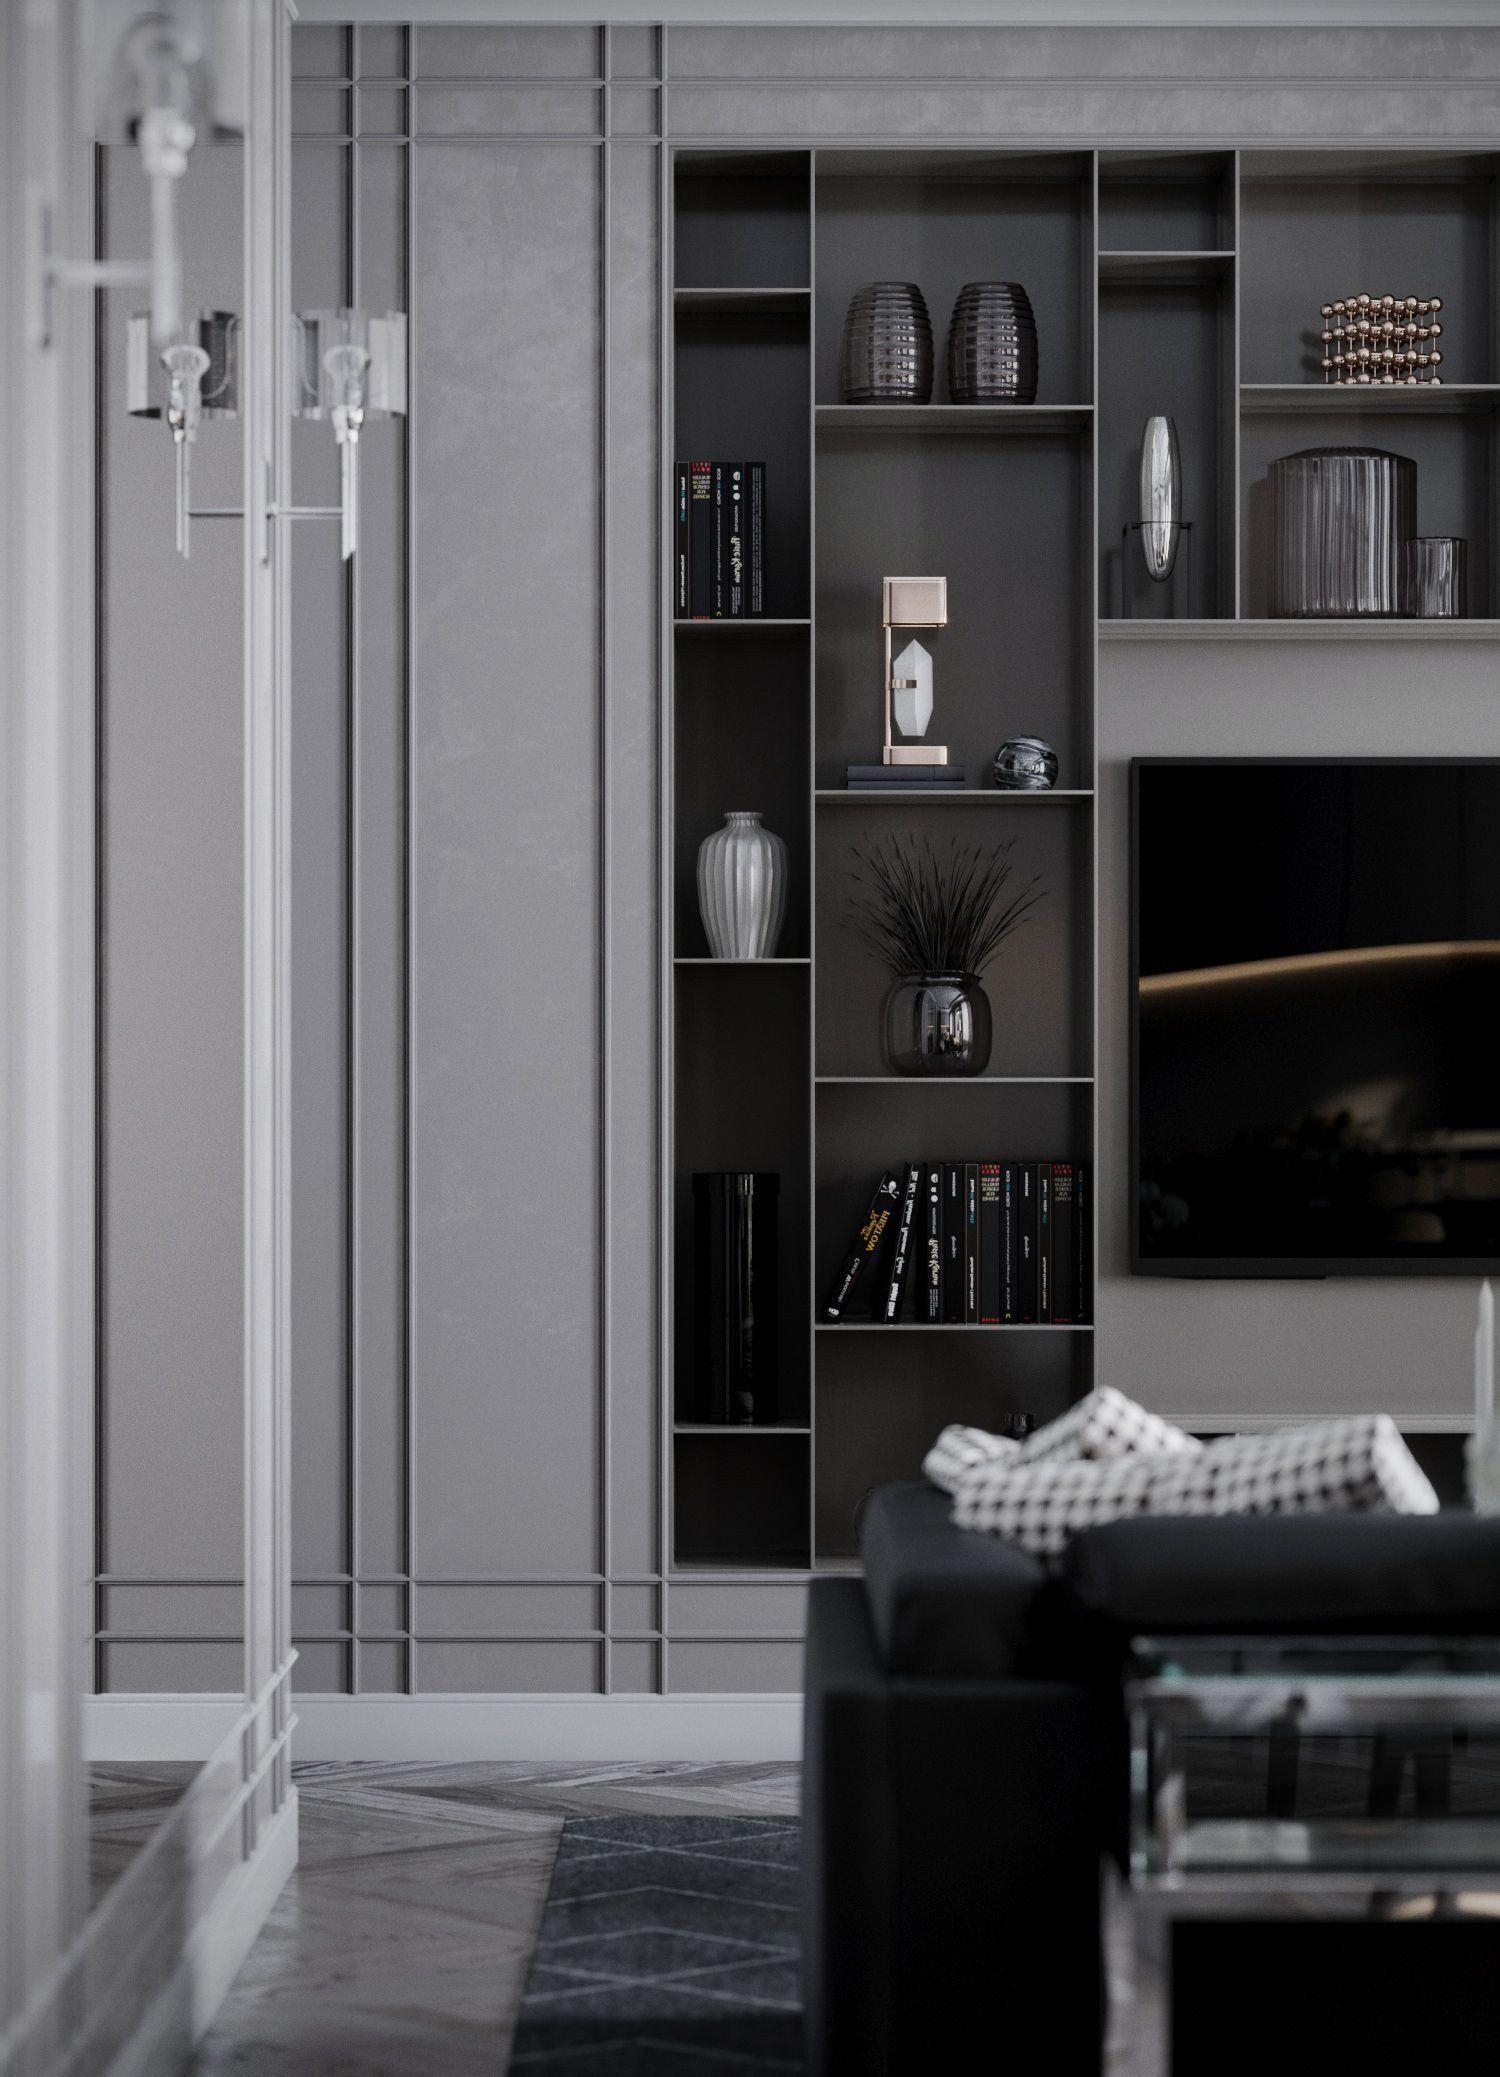 Small Living Room Storage Cabinet Living Room Kitchen Design Interior Vizual In 2020 Modern Grey Living Room Living Room Storage Cabinet Living Room And Kitchen Design